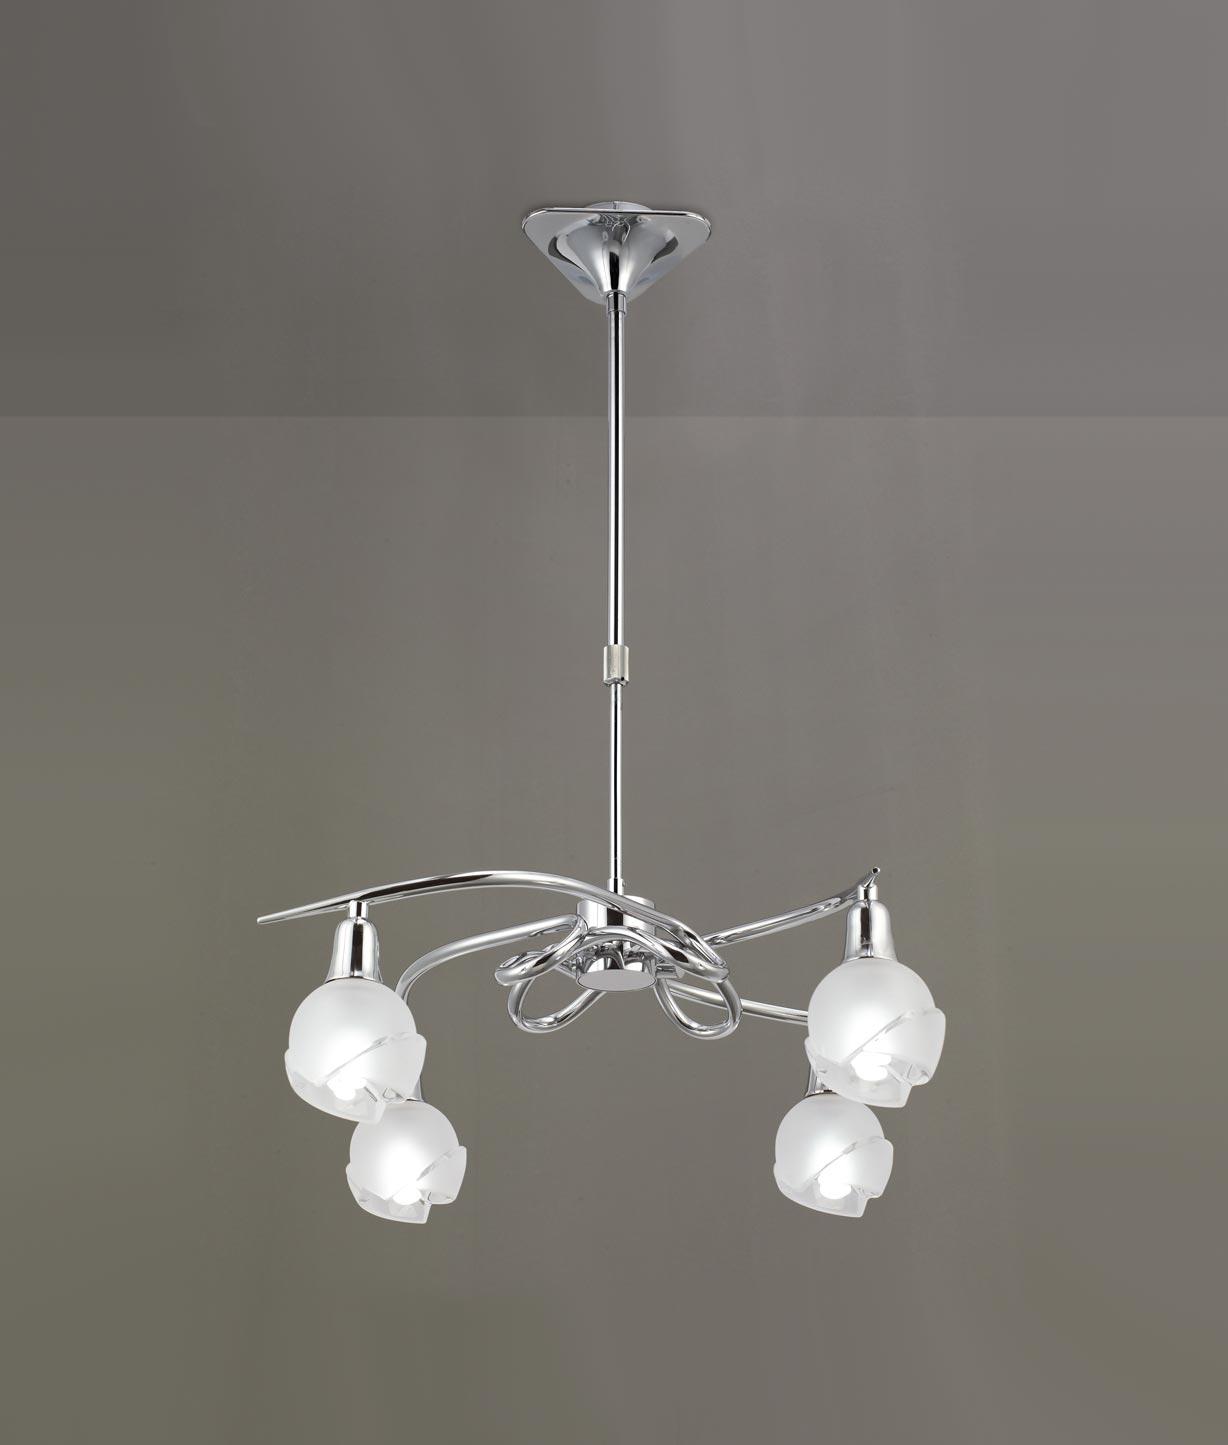 Lámpara cromo 4 luces BALI